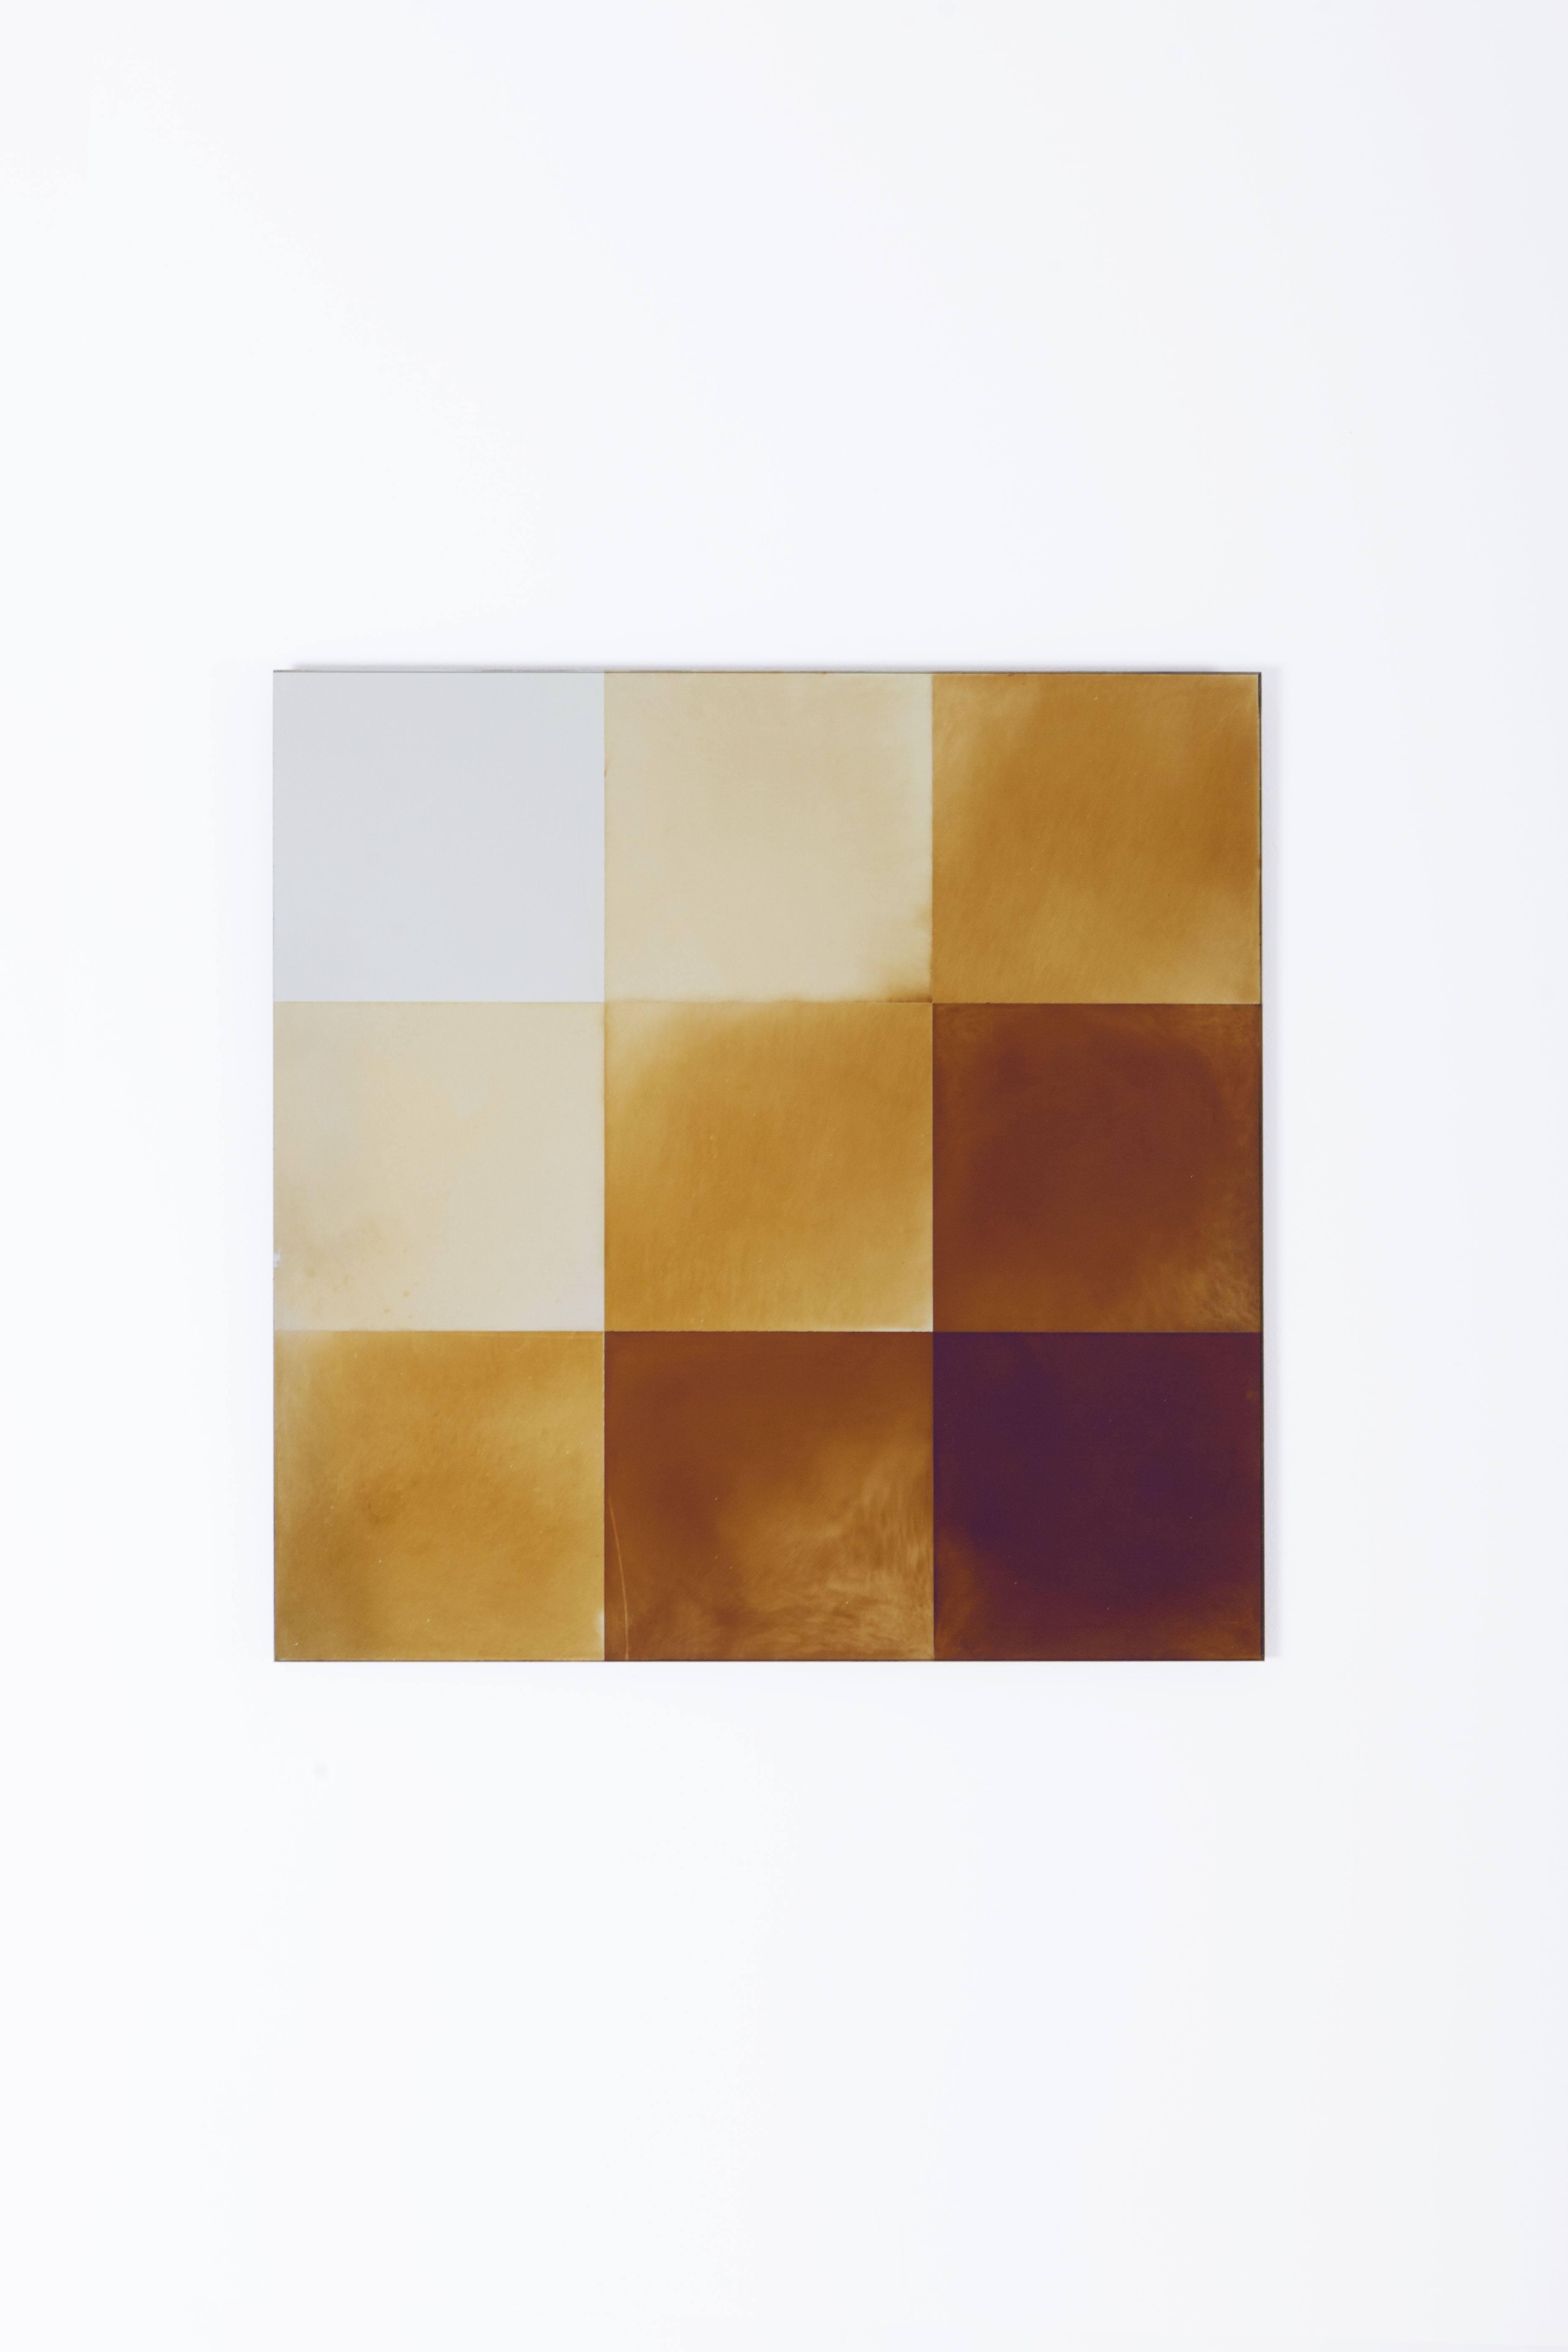 Transience Mirror Square - merk: Transnatural Art & Design Label